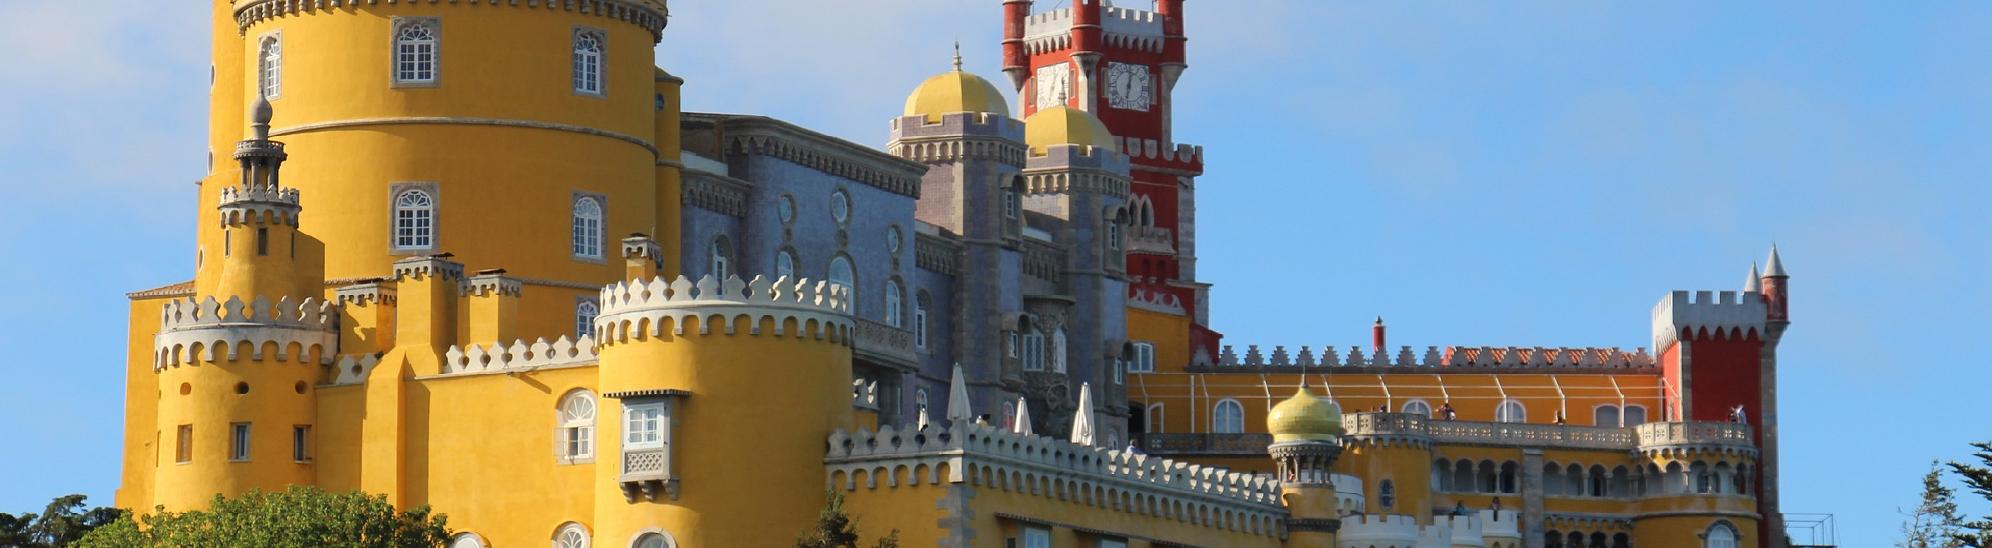 Hotel + Bilhetes Parques de Sintra